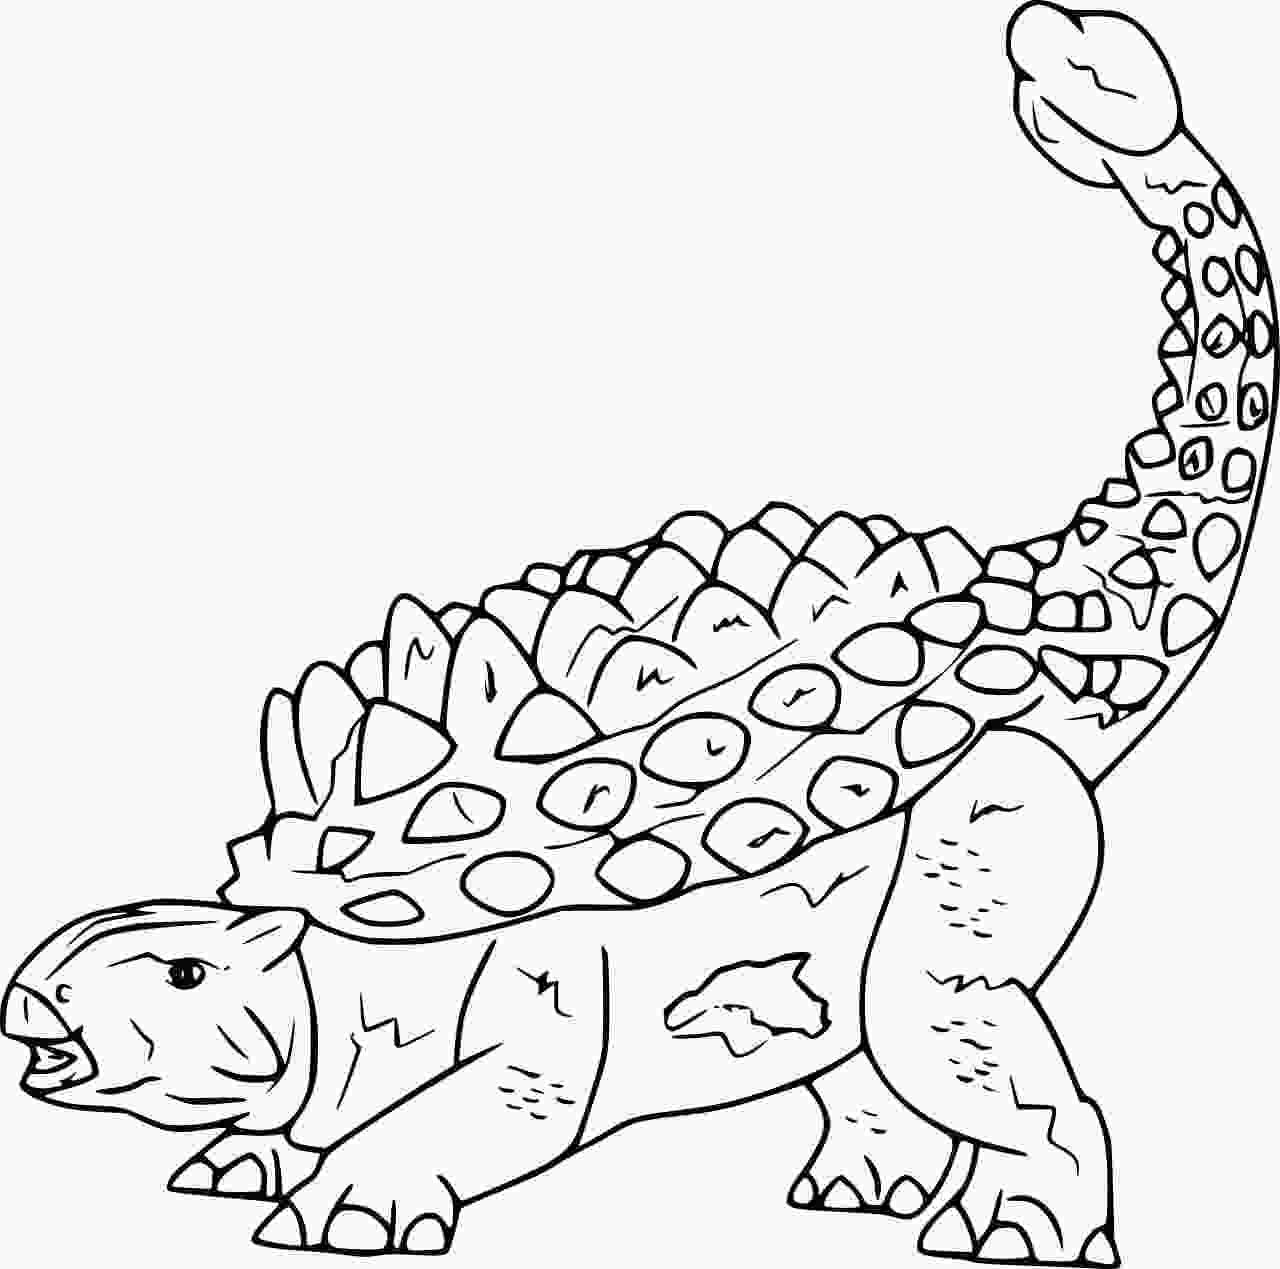 Crichtonsaurus is a genus of ankylosaurid dinosaur that originated from Late Cretaceous Asia